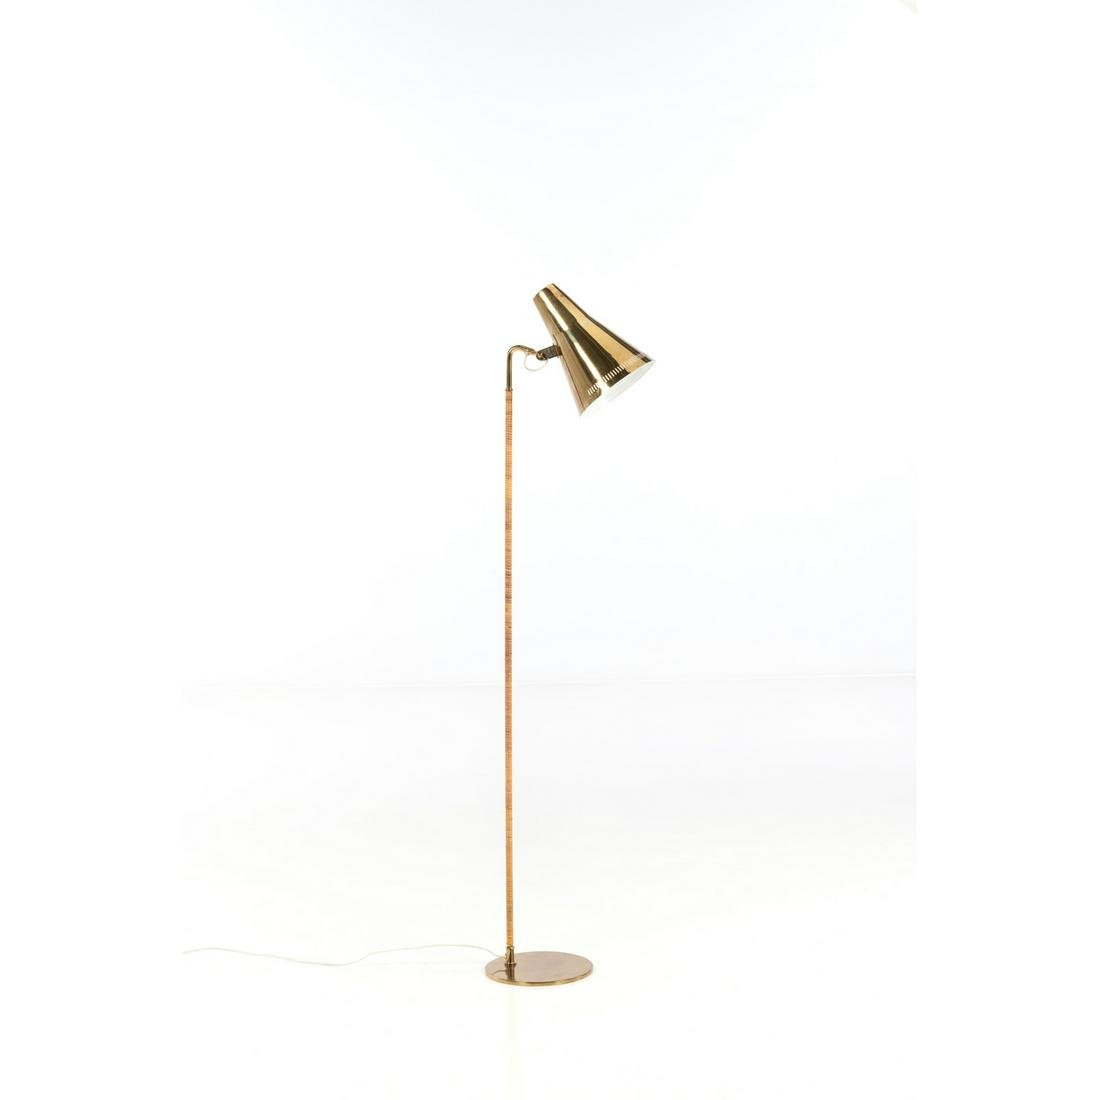 Paavo Tynell (1890-1973) Model no. 9628 Floor lamp